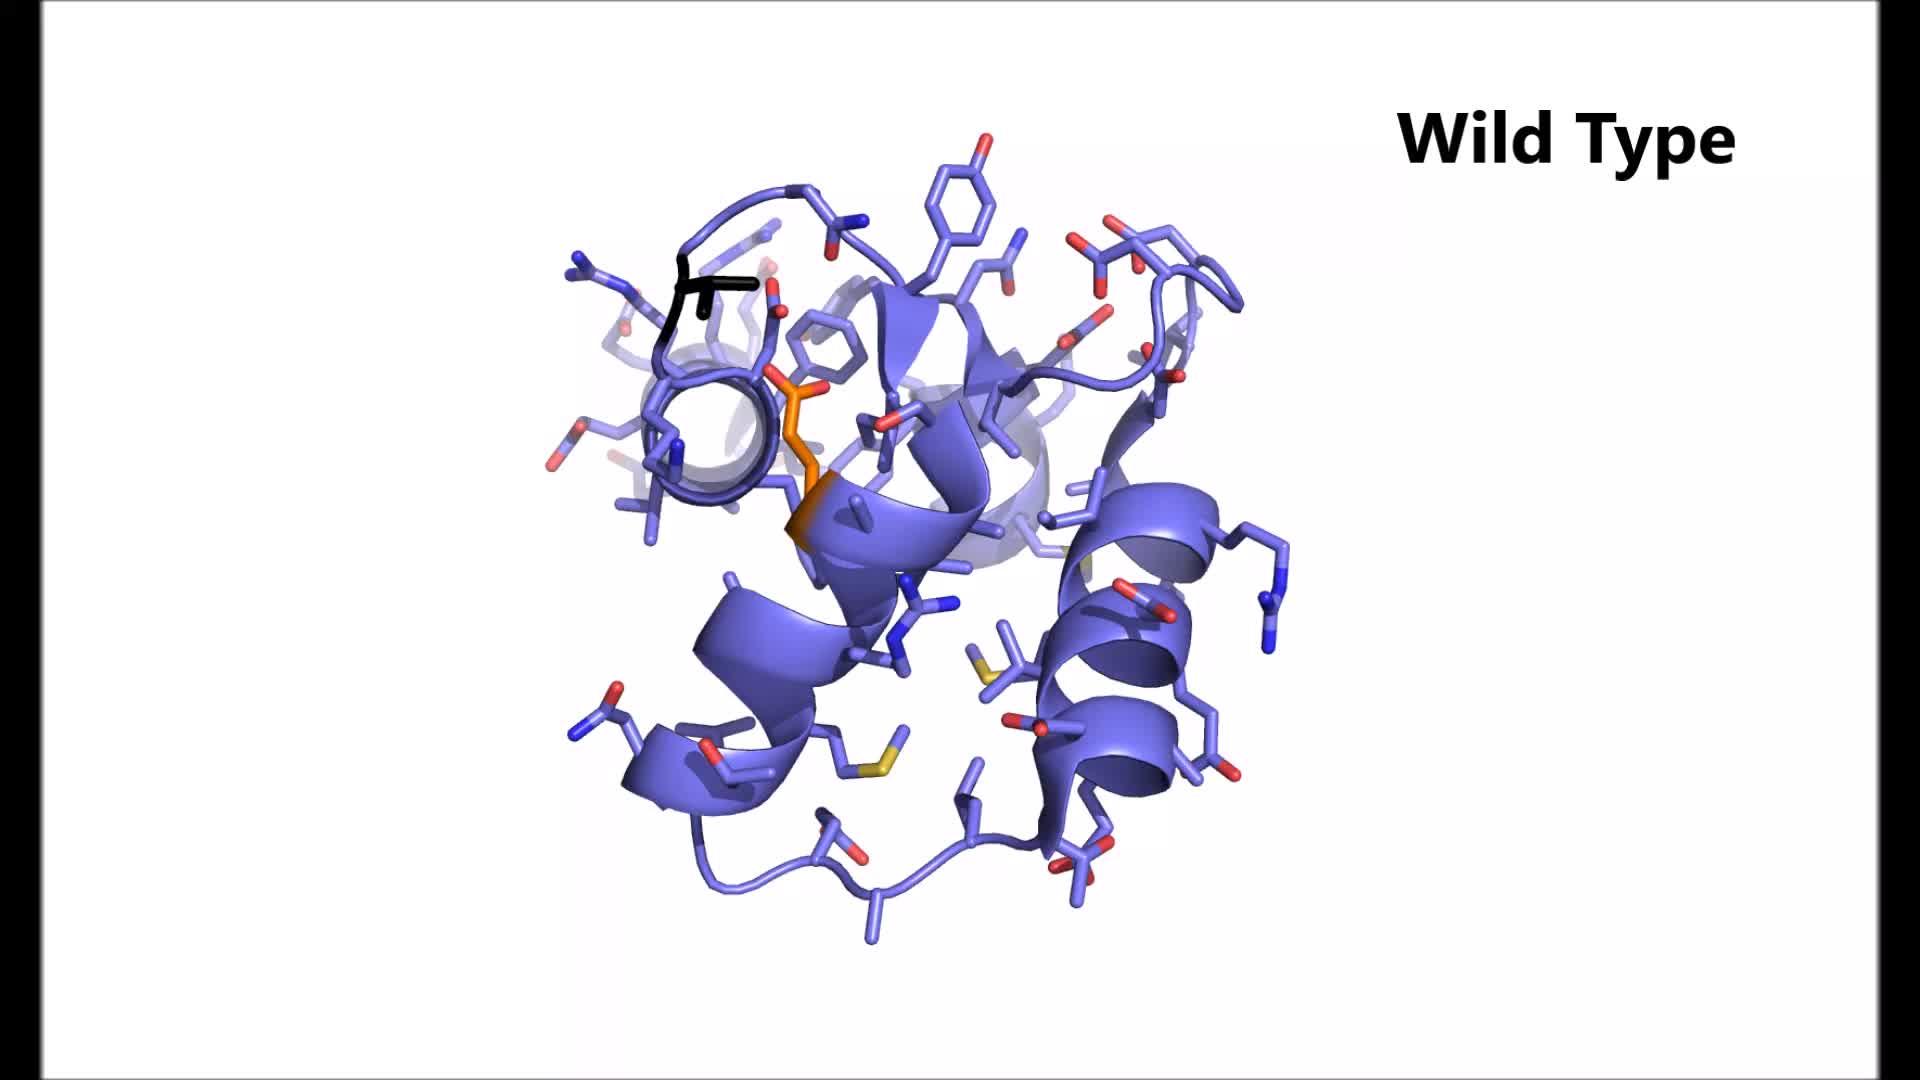 Arrhythmia mutations in calmodulin cause conformational